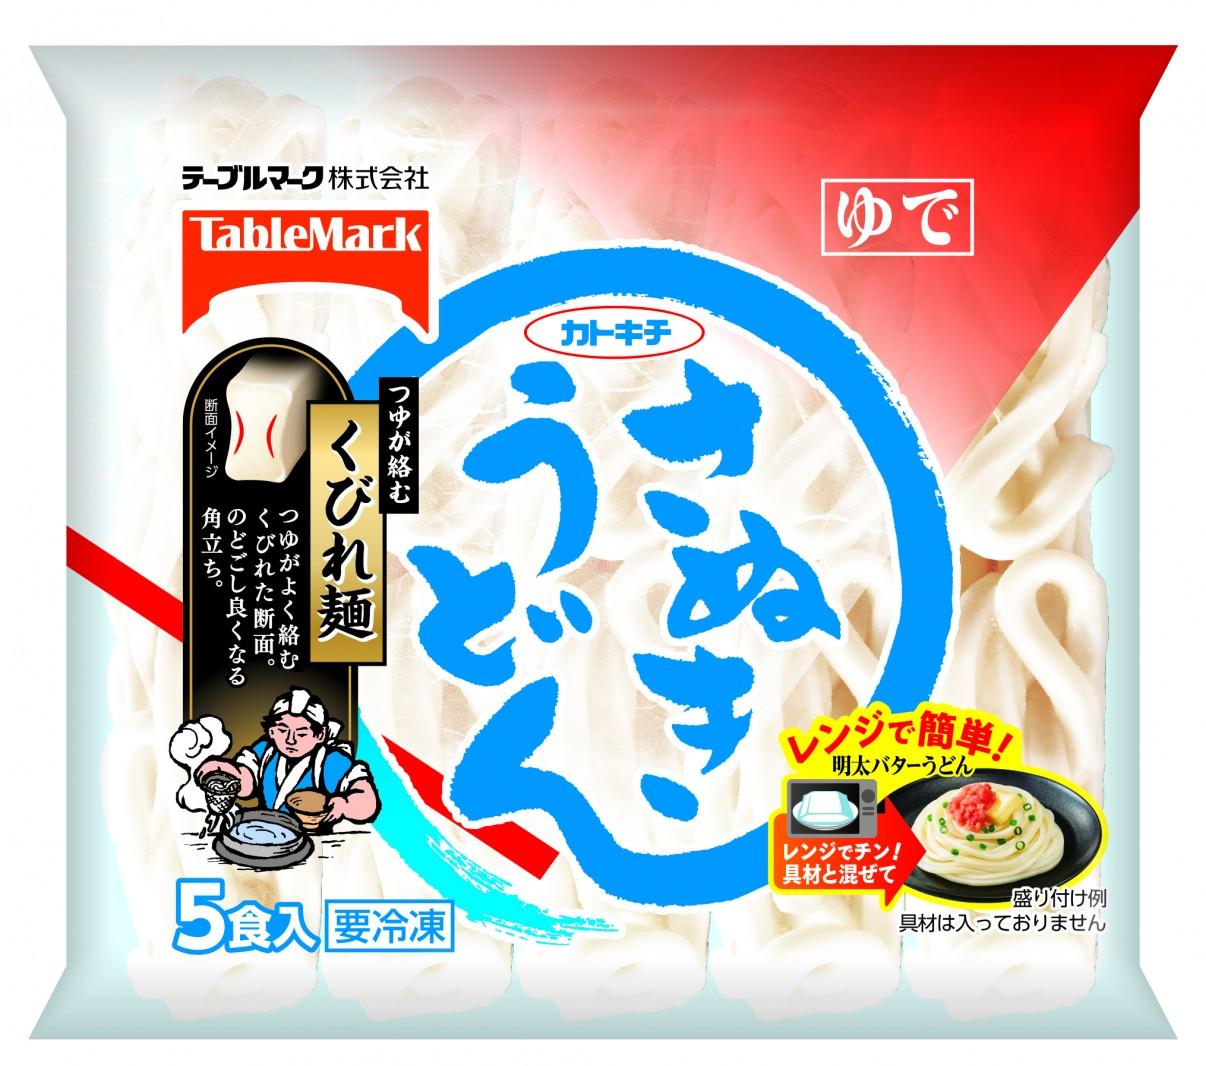 「FLASH」web 年末年始おすすめ 大活躍する便利な冷凍食品は